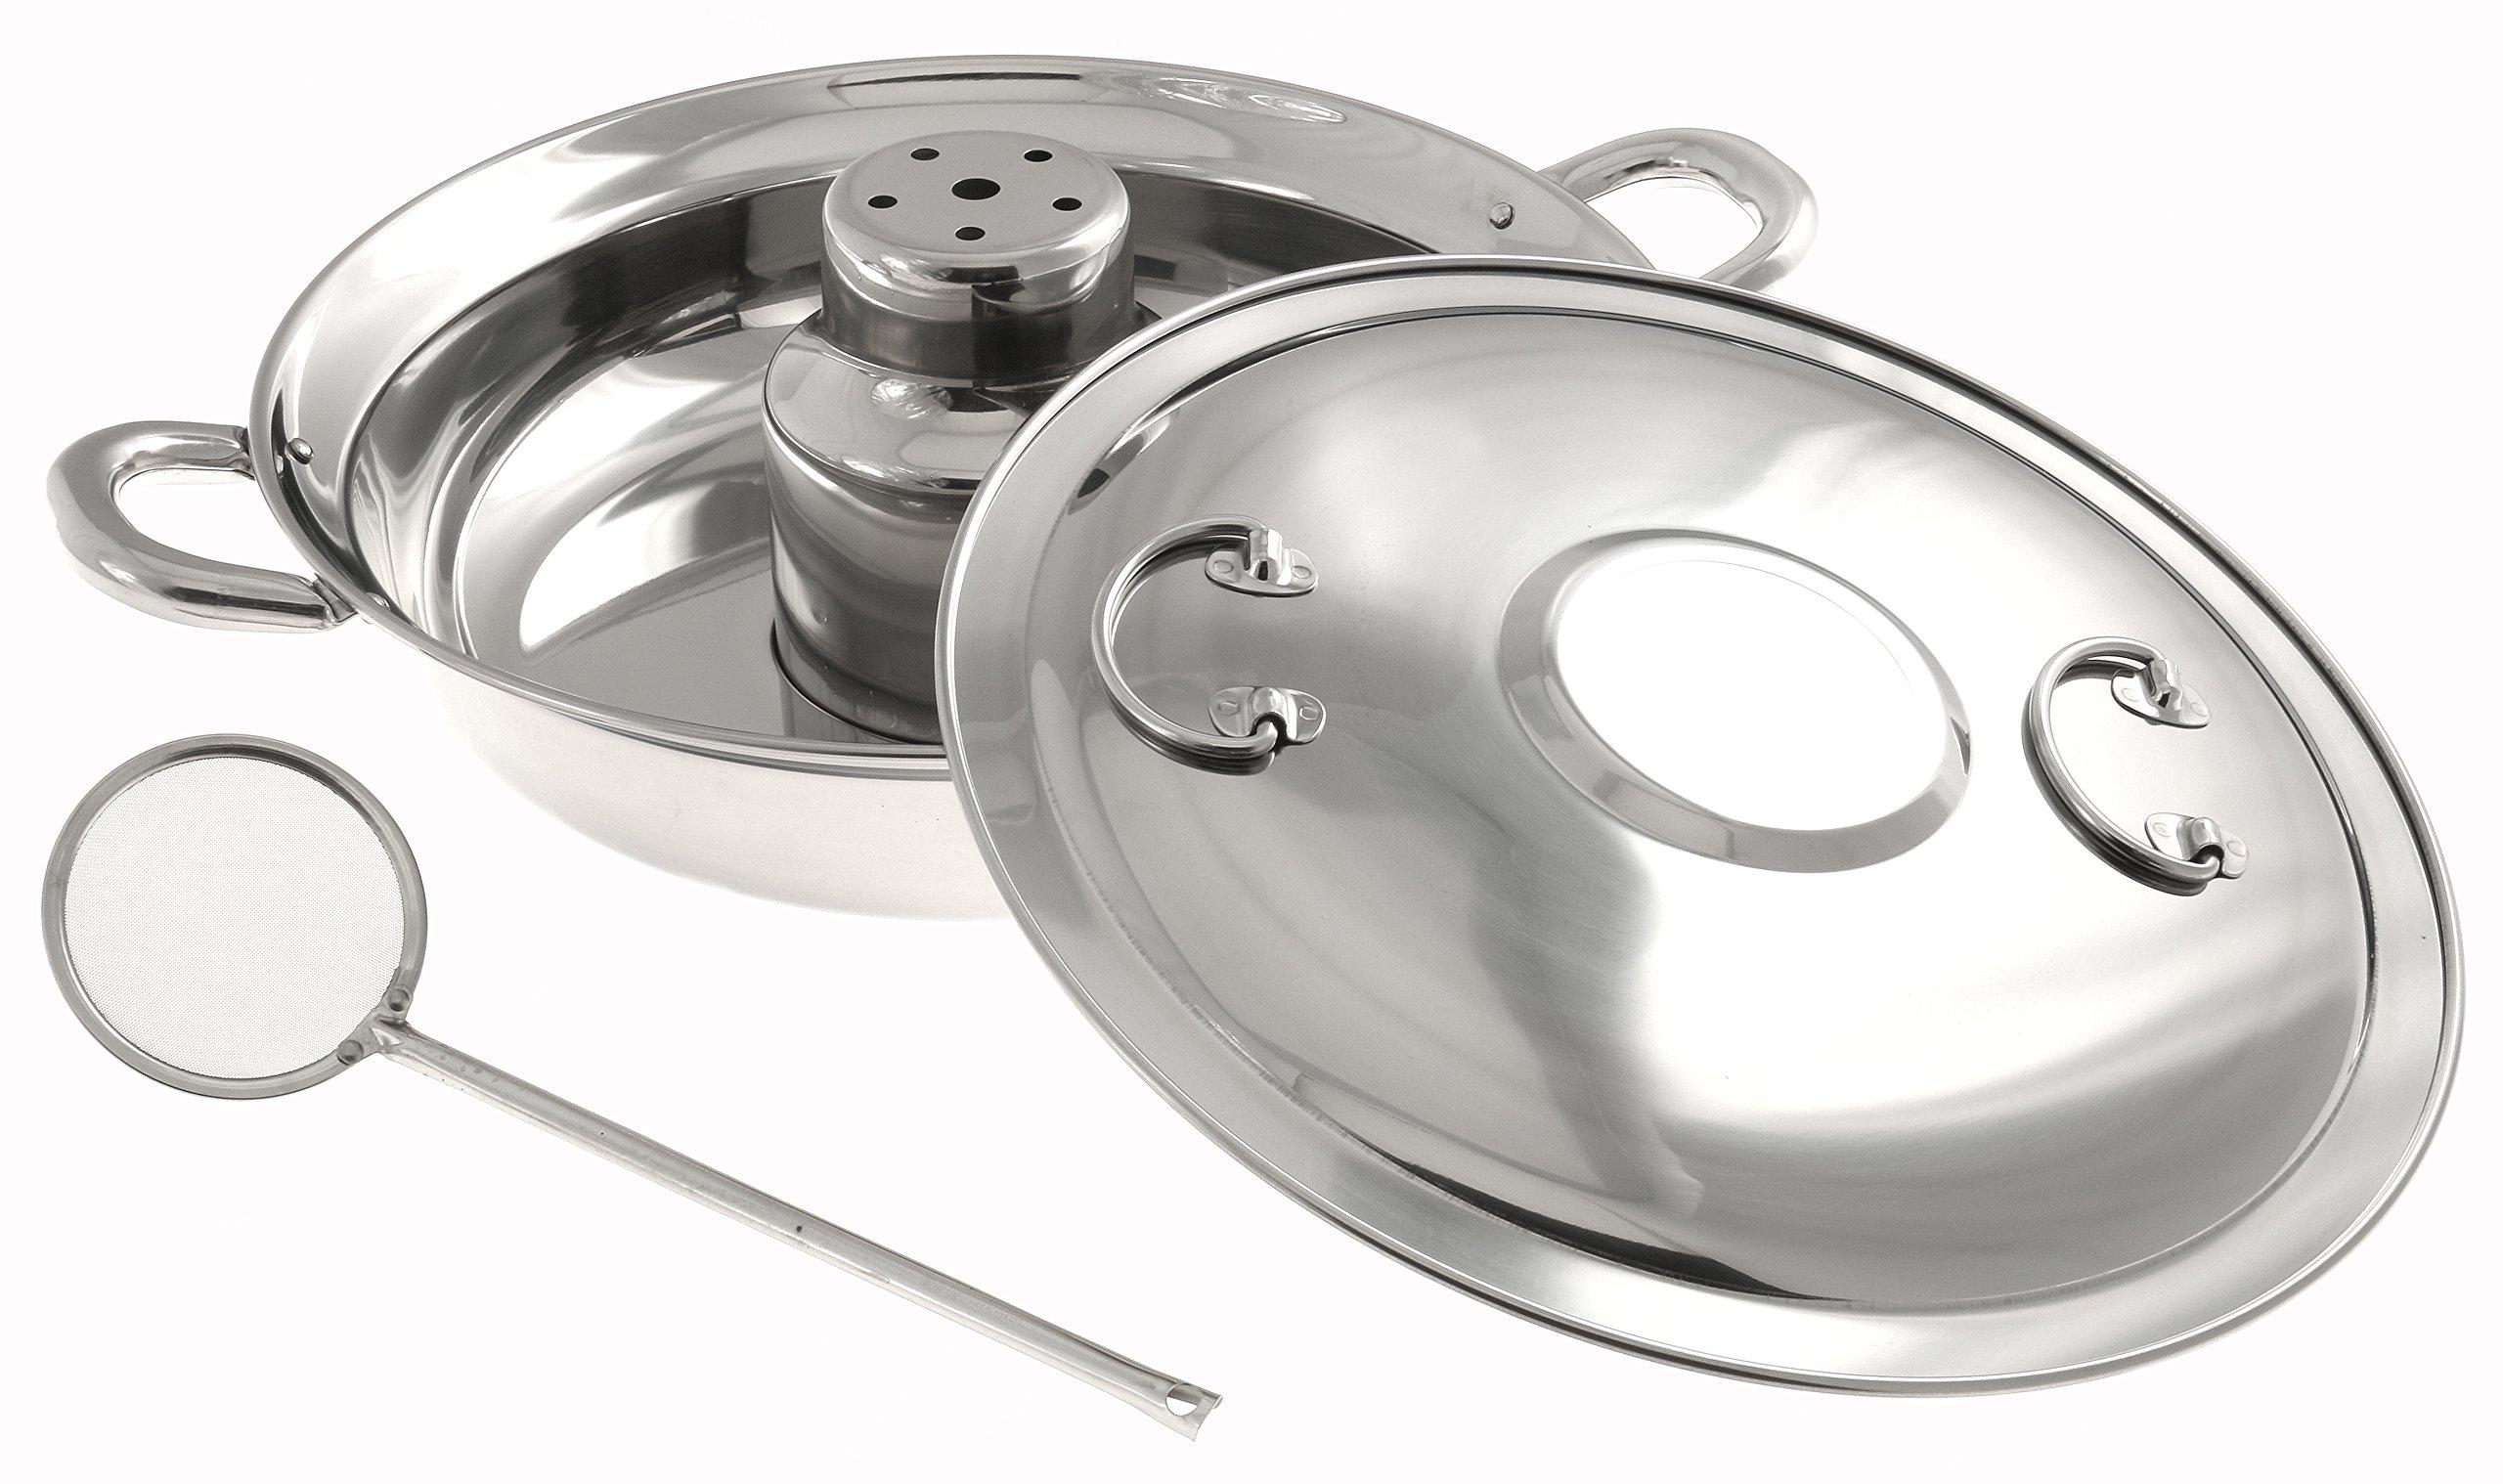 Kotobuki Traditional Japanese Stainless Steel Shabu Pot with Skimmer, Silver by Kotobuki (Image #2)